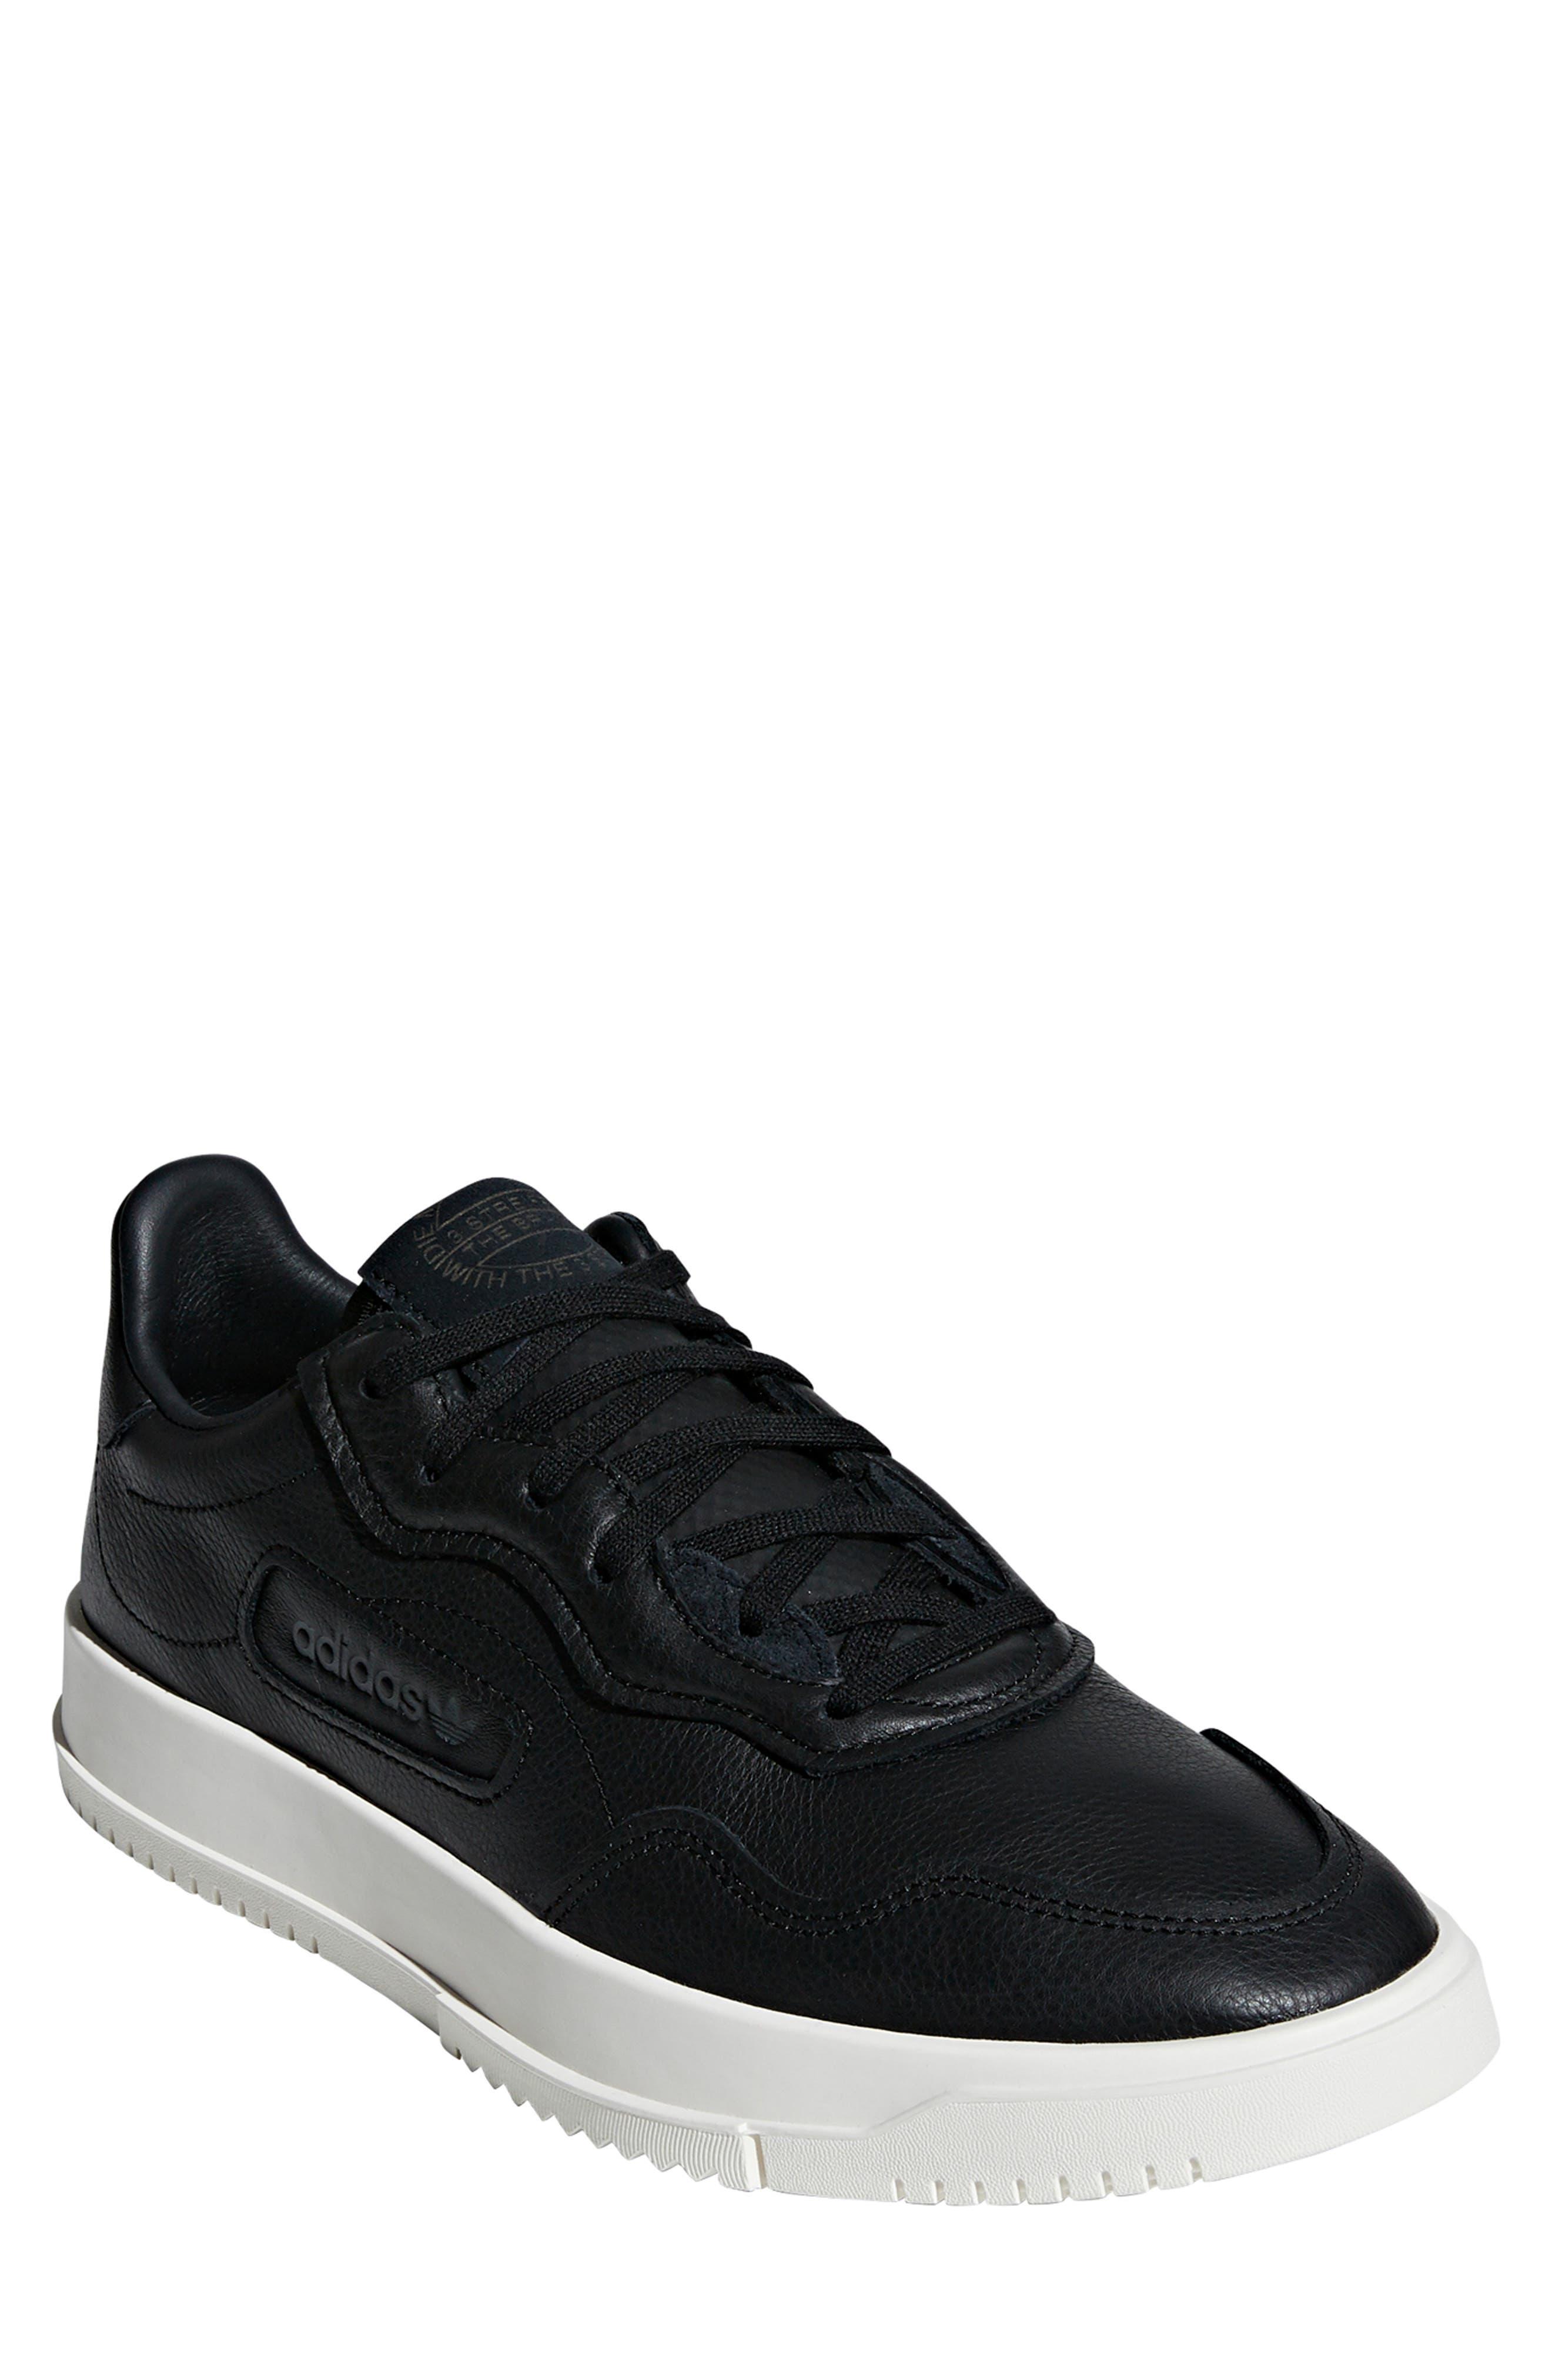 SC Premiere Sneaker, Main, color, 001